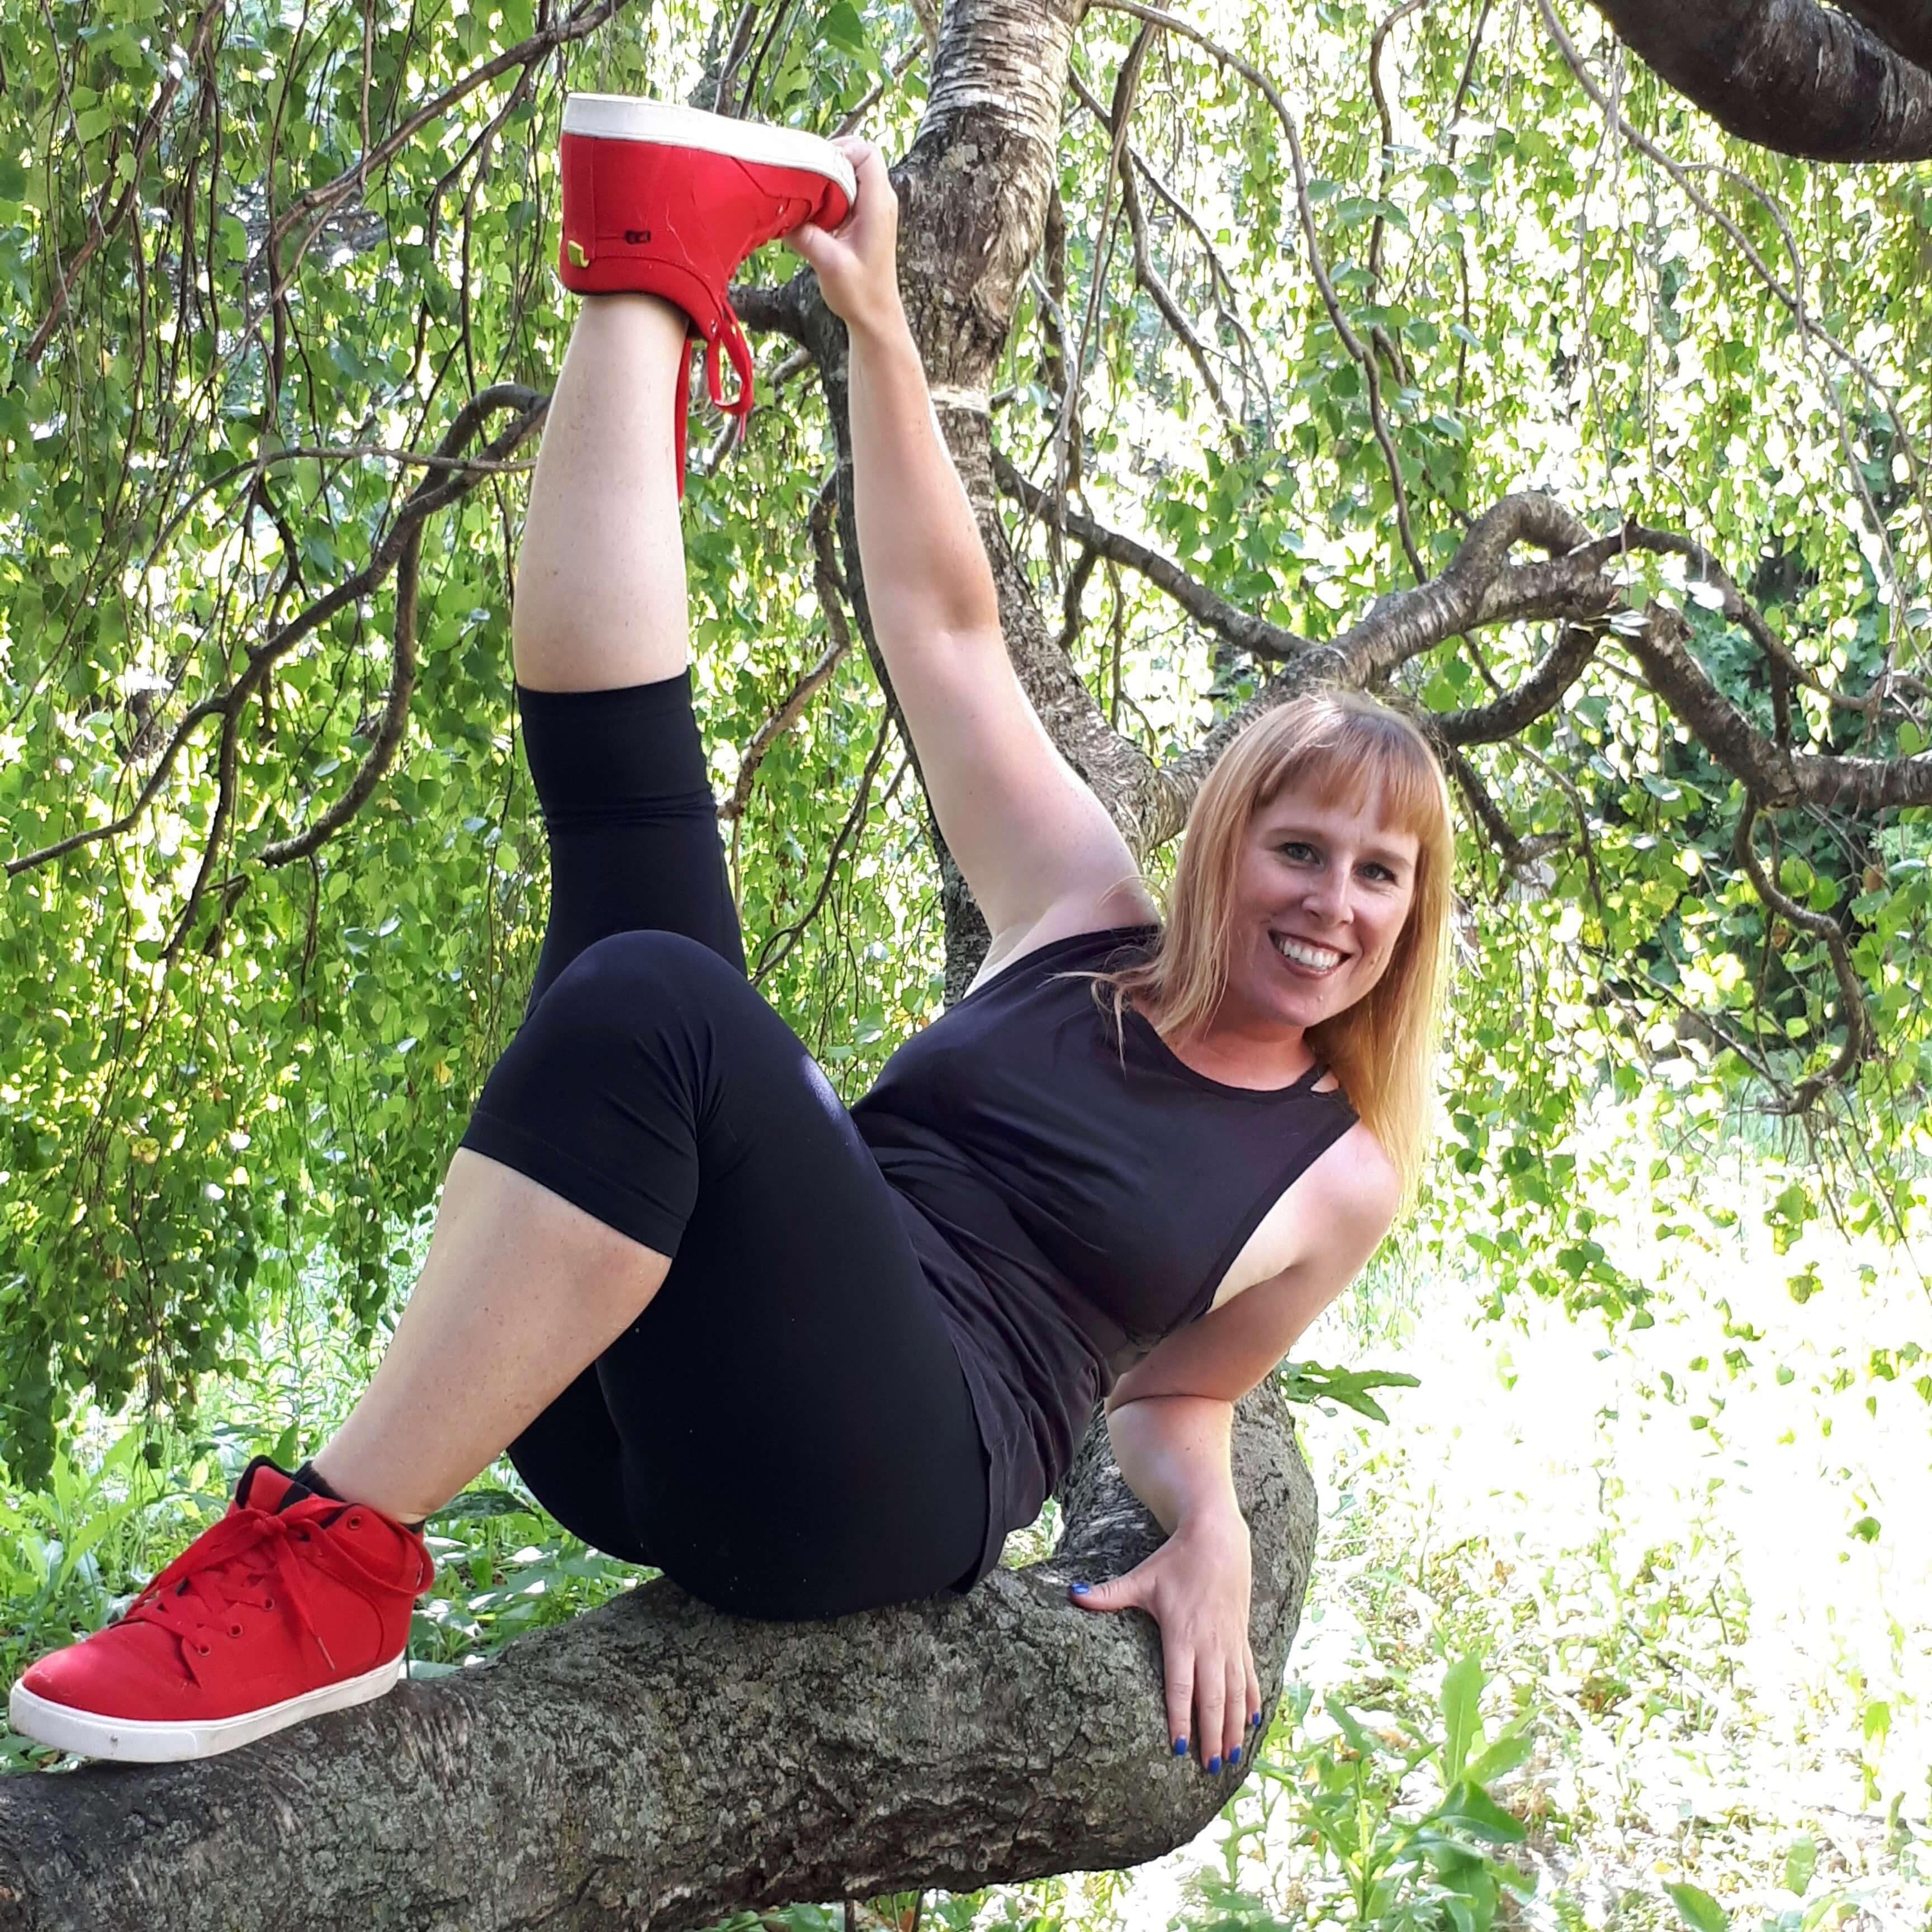 Melanie Boucher, Extensa Fitness master trainer